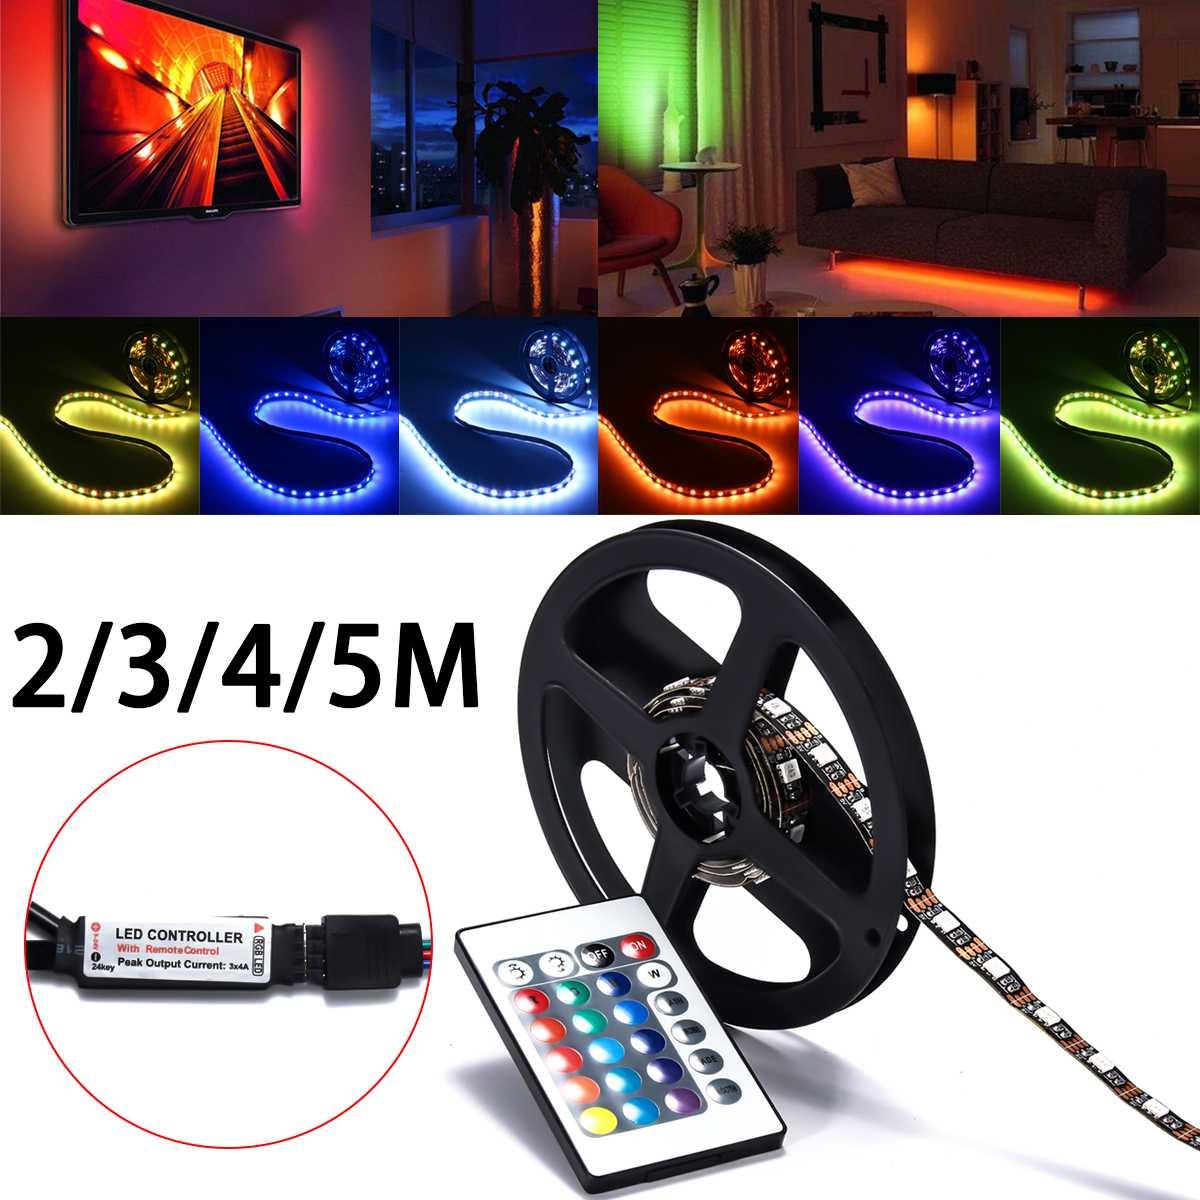 0.5/1/2/3/4/5M LED Non-waterproof RGB Led Strip Light 5050 DC5V 60smd/M Flexible Lighting Ribbon Tape Remote Control